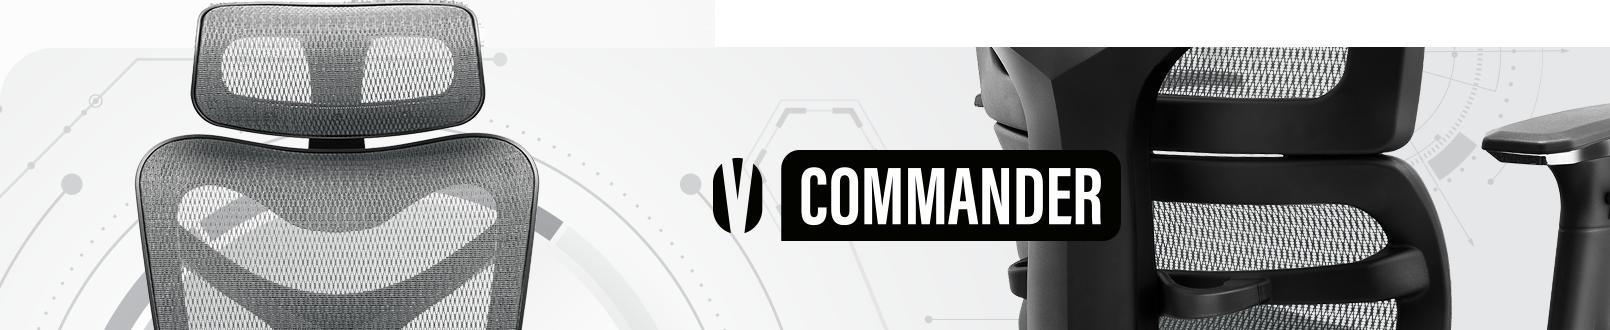 V-Commander